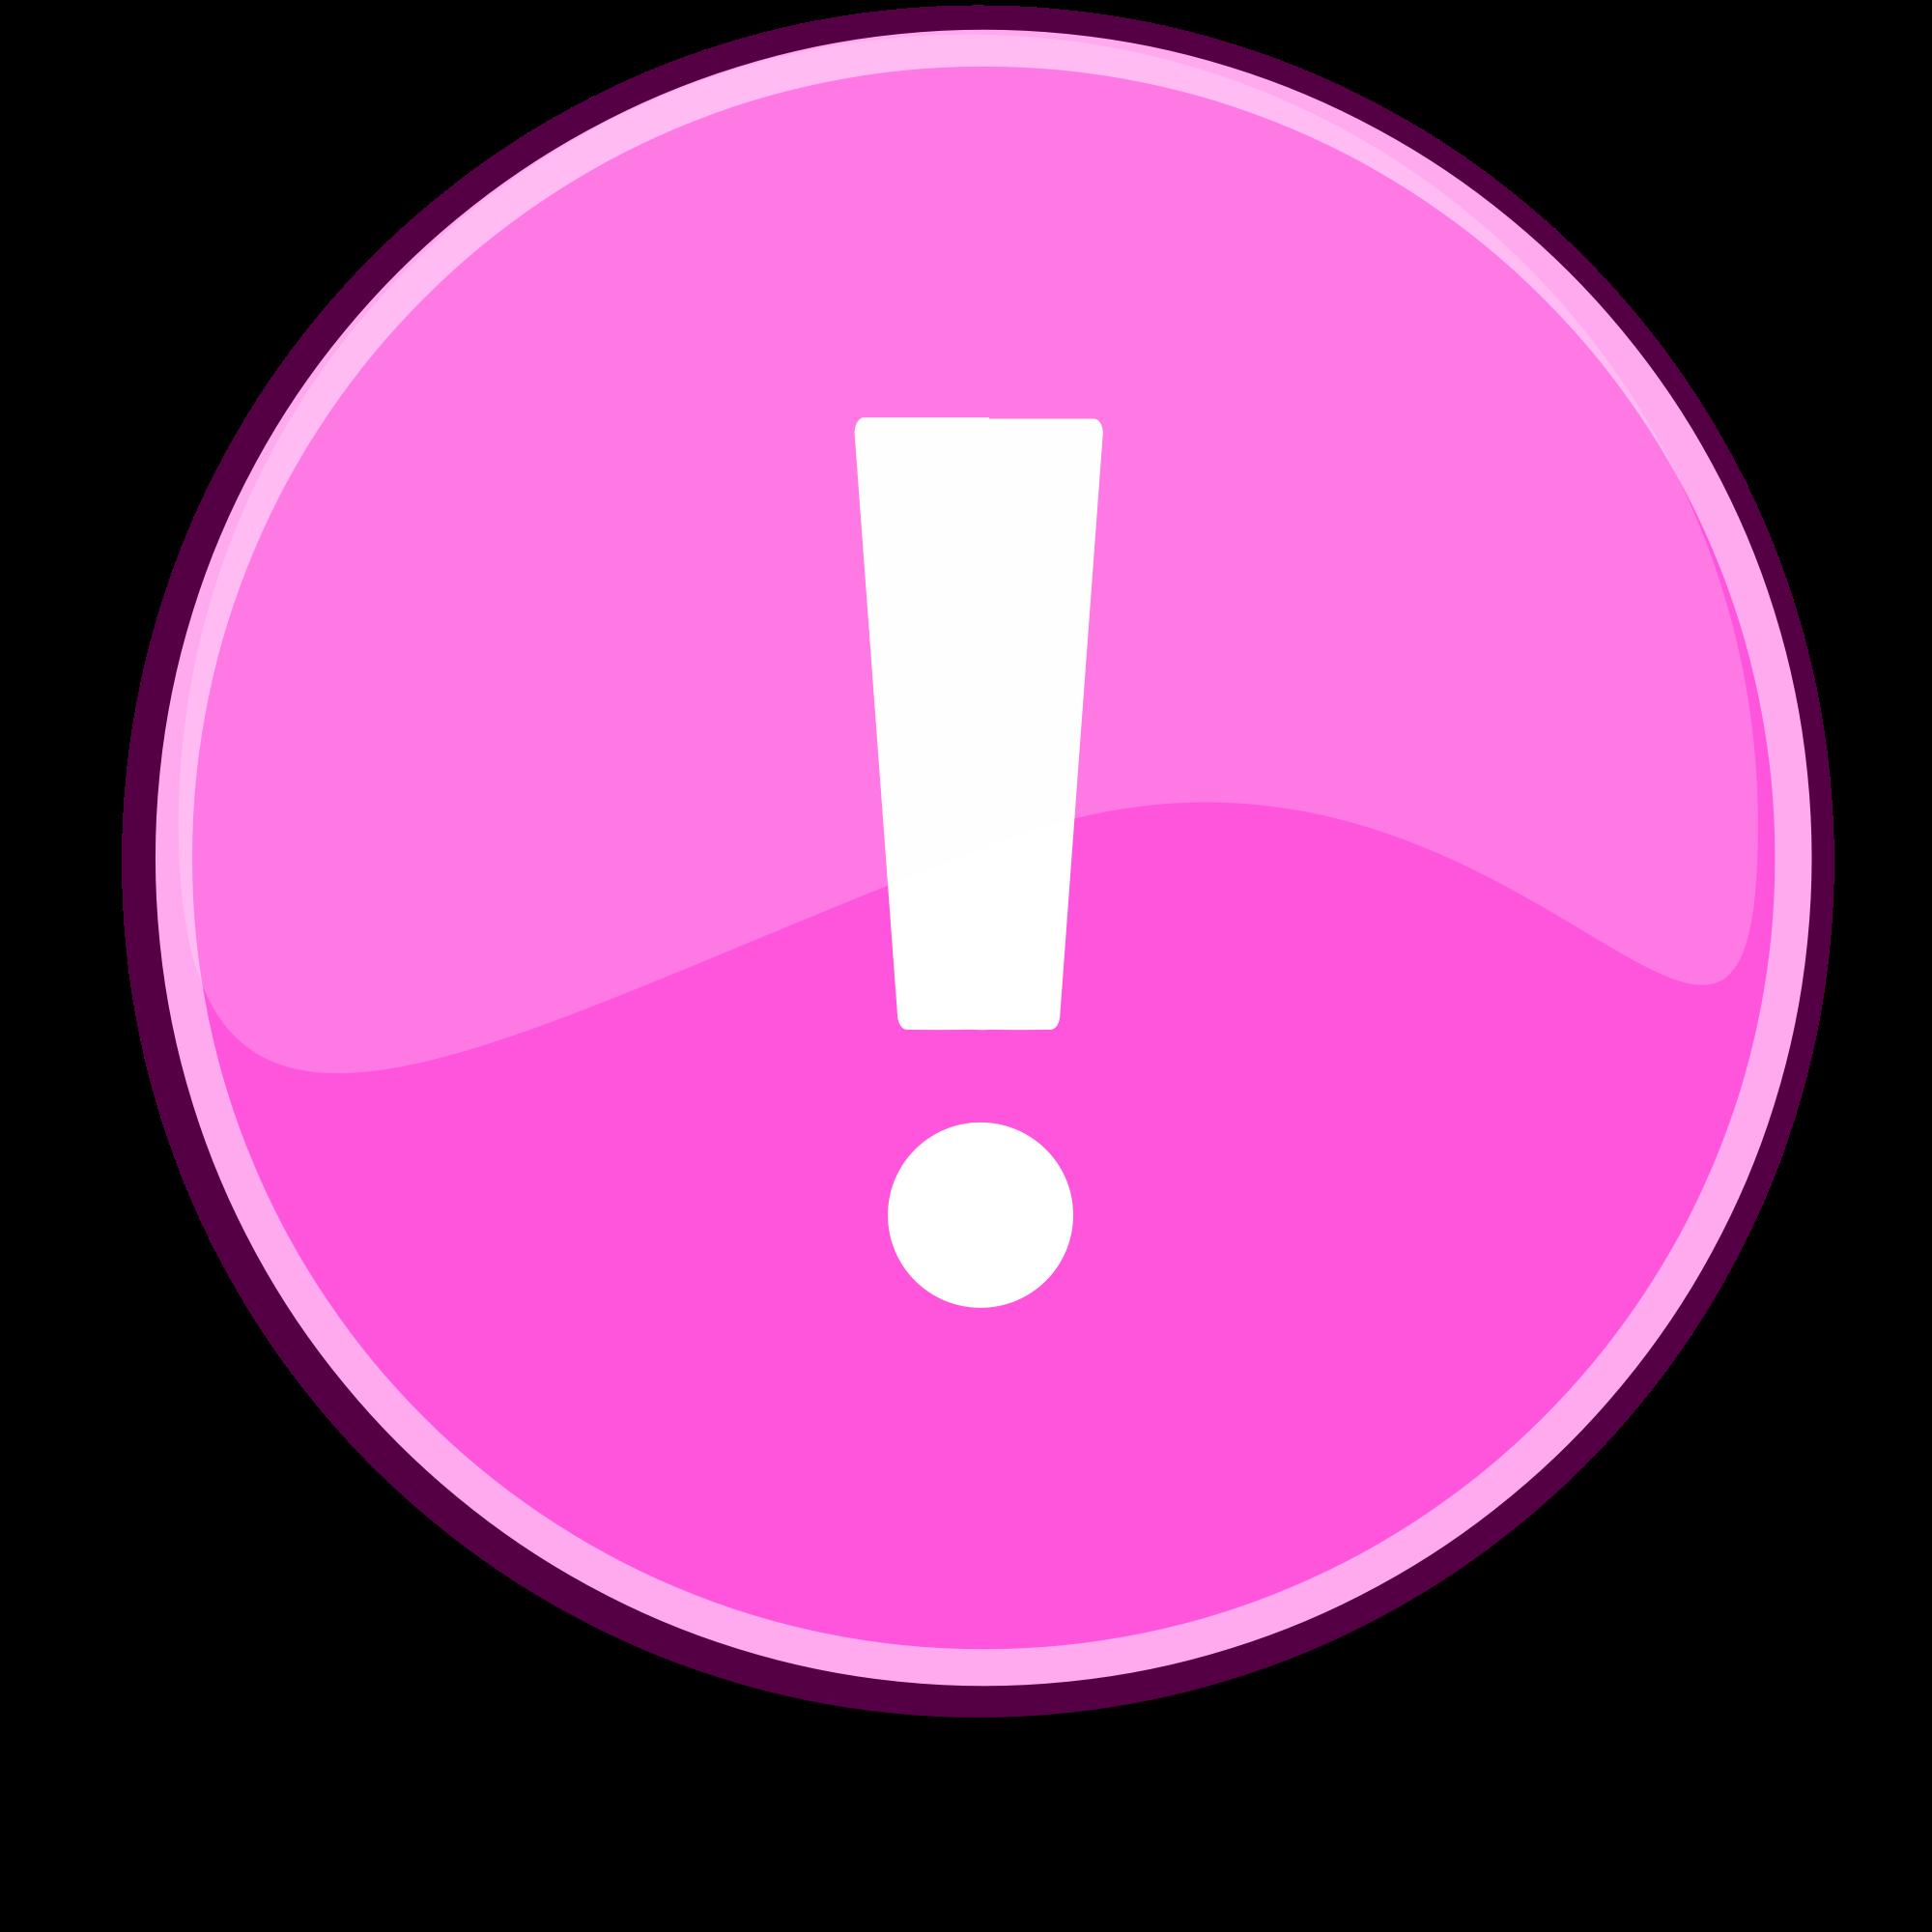 Pink svg #13, Download drawings